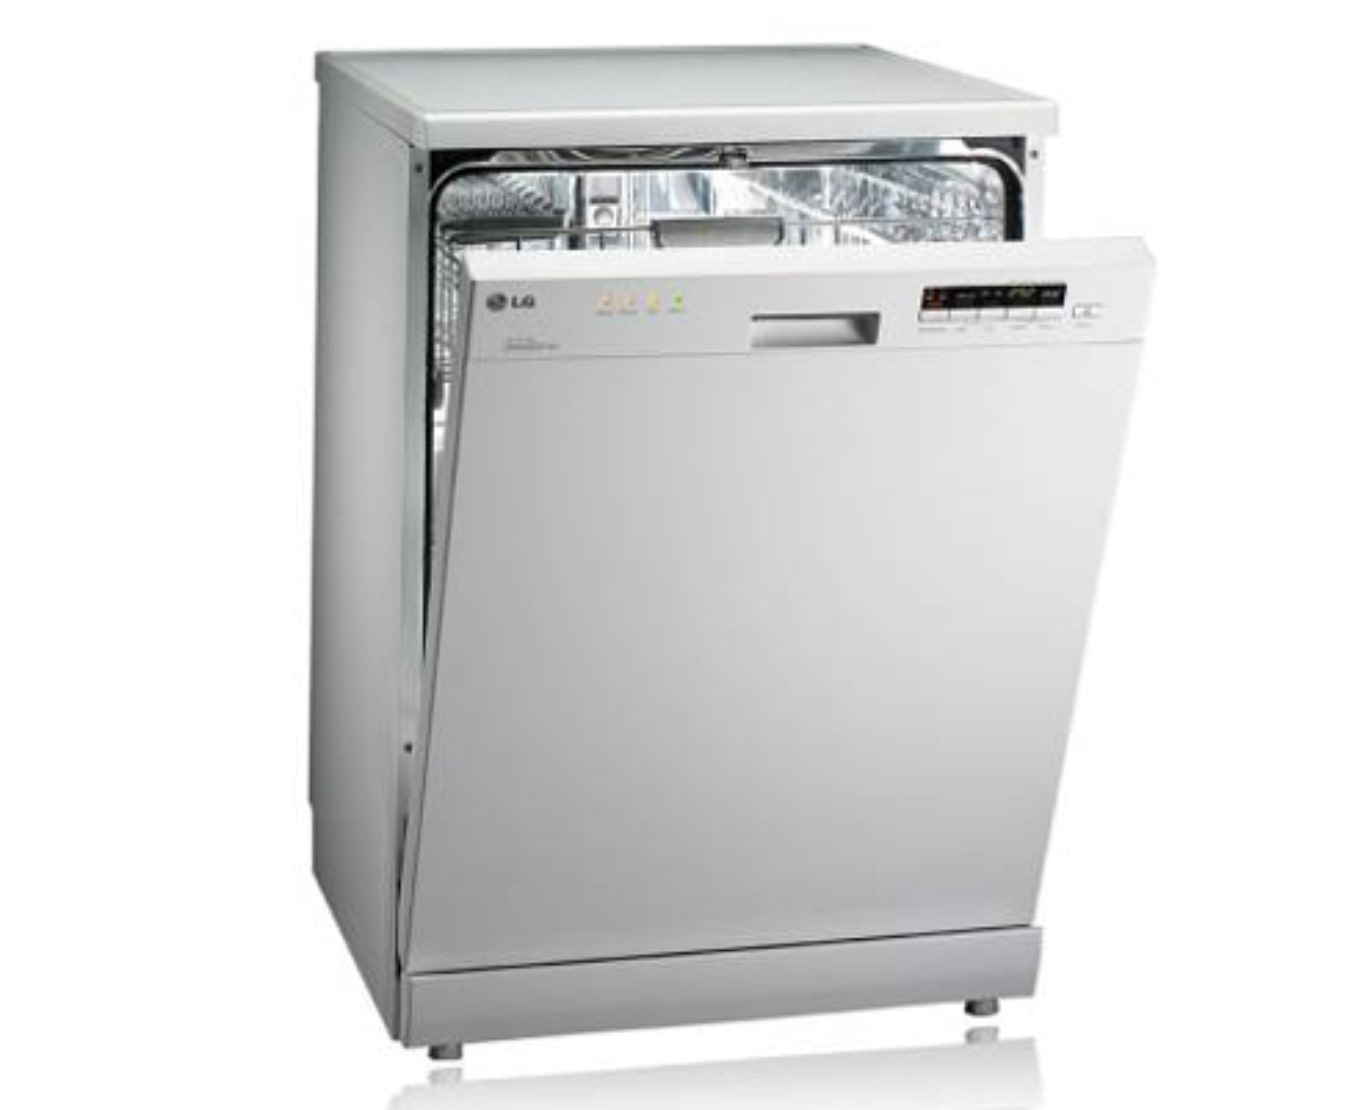 Lg D1452wf White Dishwasher